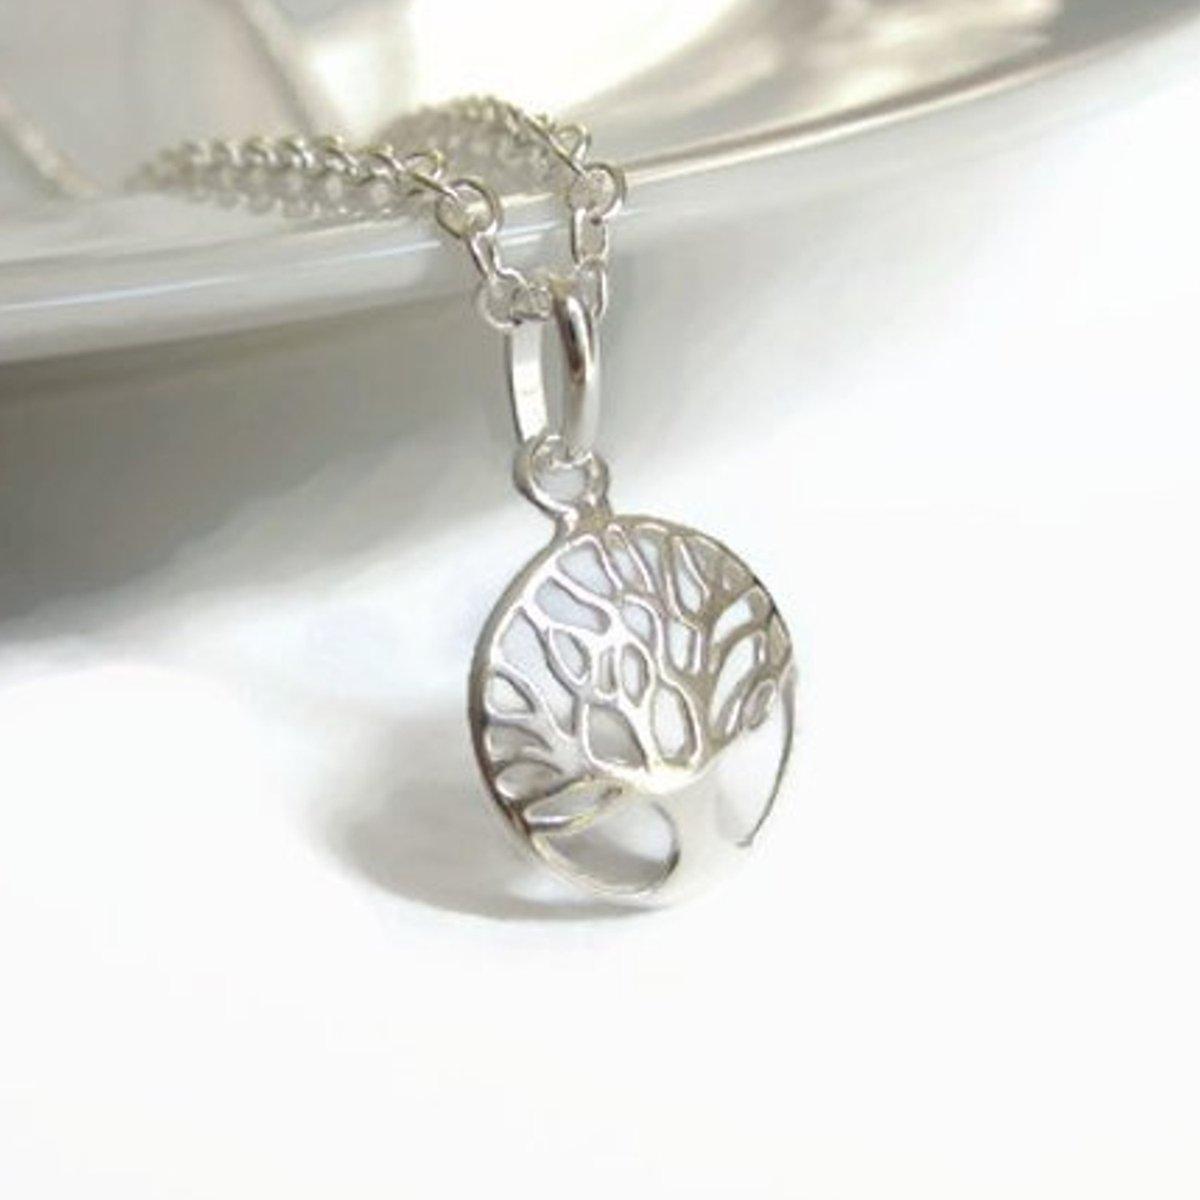 This Sterling silver Tree of Life necklace is a lovely #giftidea - available gift-boxed :)  #handmade #uksmallbiz #uk #londonislovinit #smallbiz #womaninbizhour